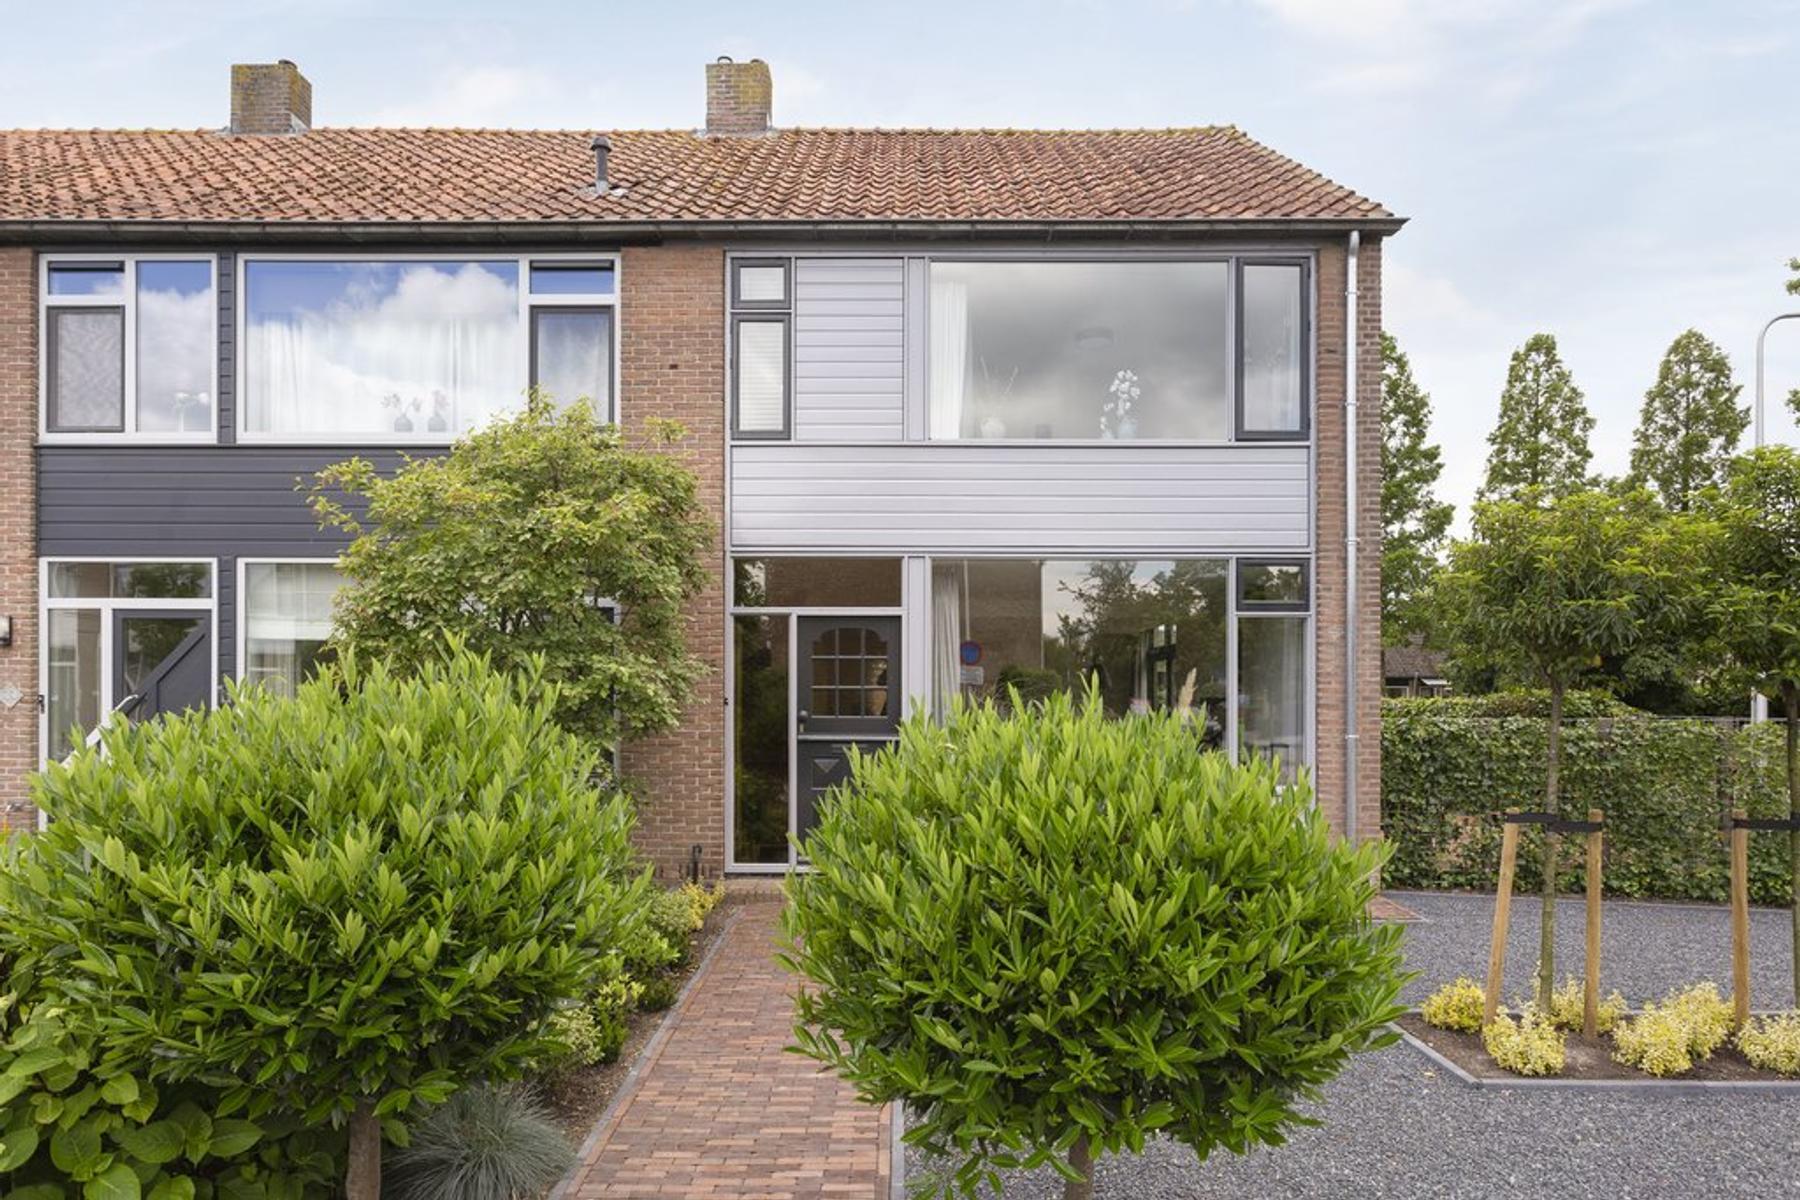 Azaleastraat 35 in Stolwijk 2821 TN